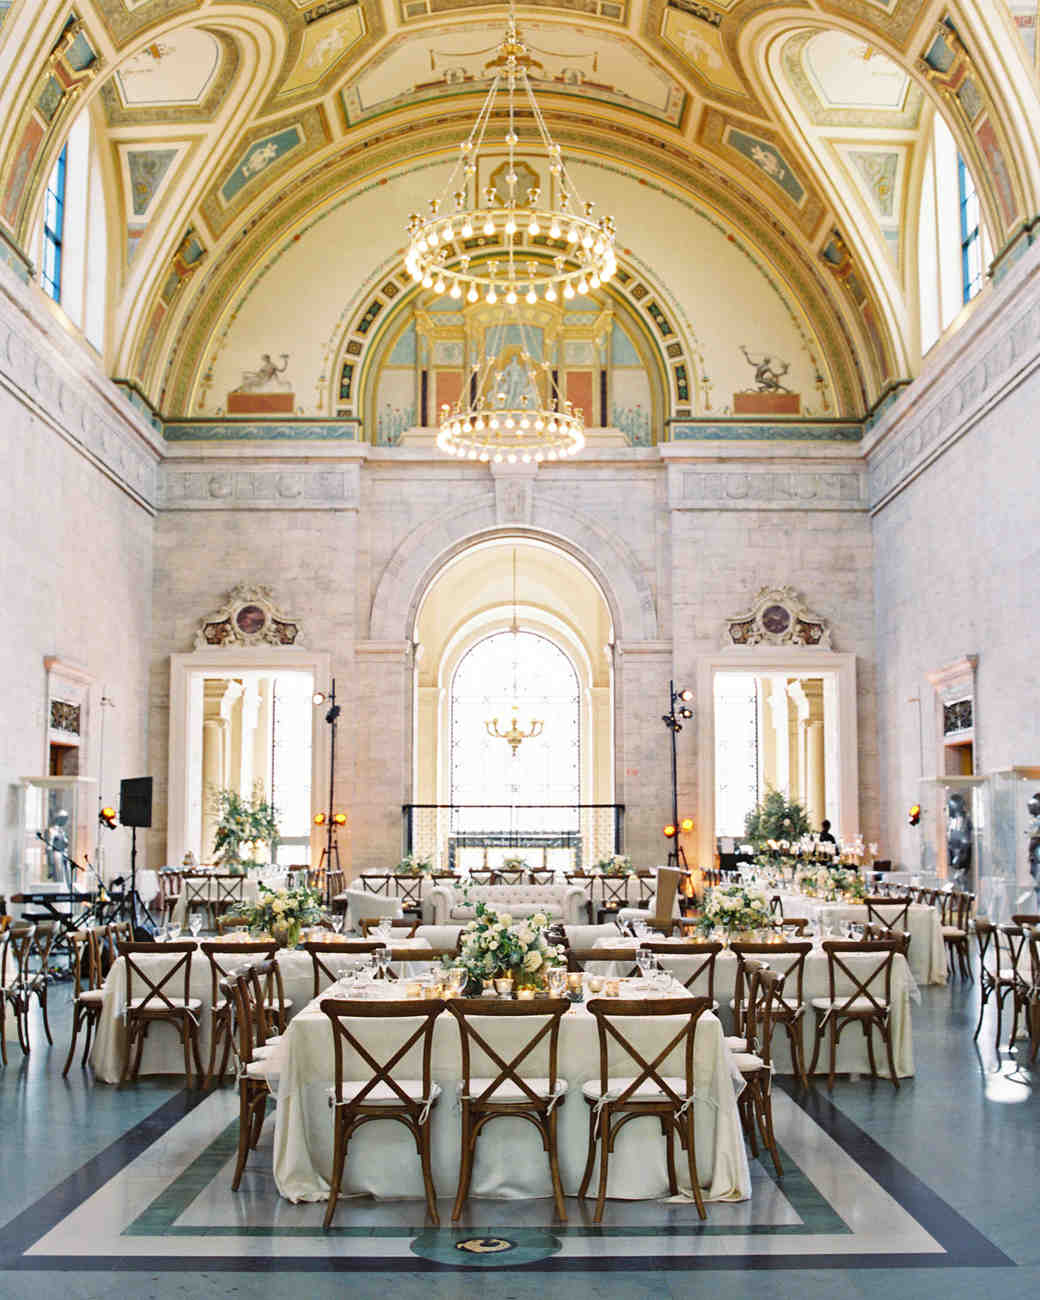 meki ian wedding michigan great hall tables